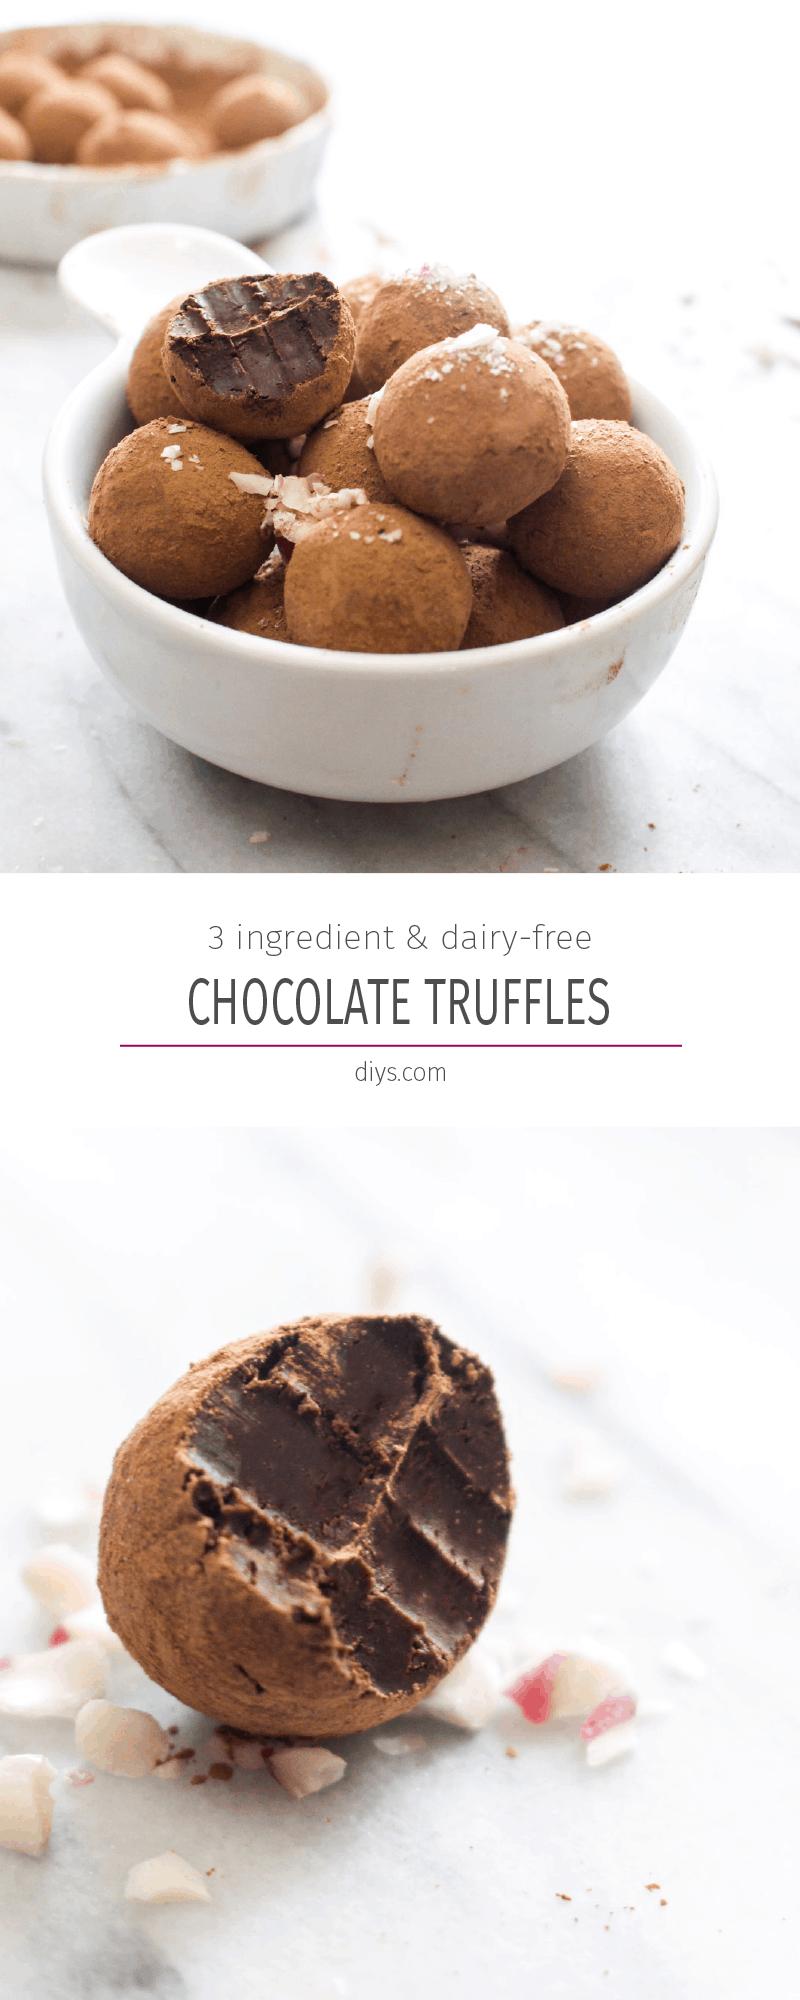 Chocolate truffles top